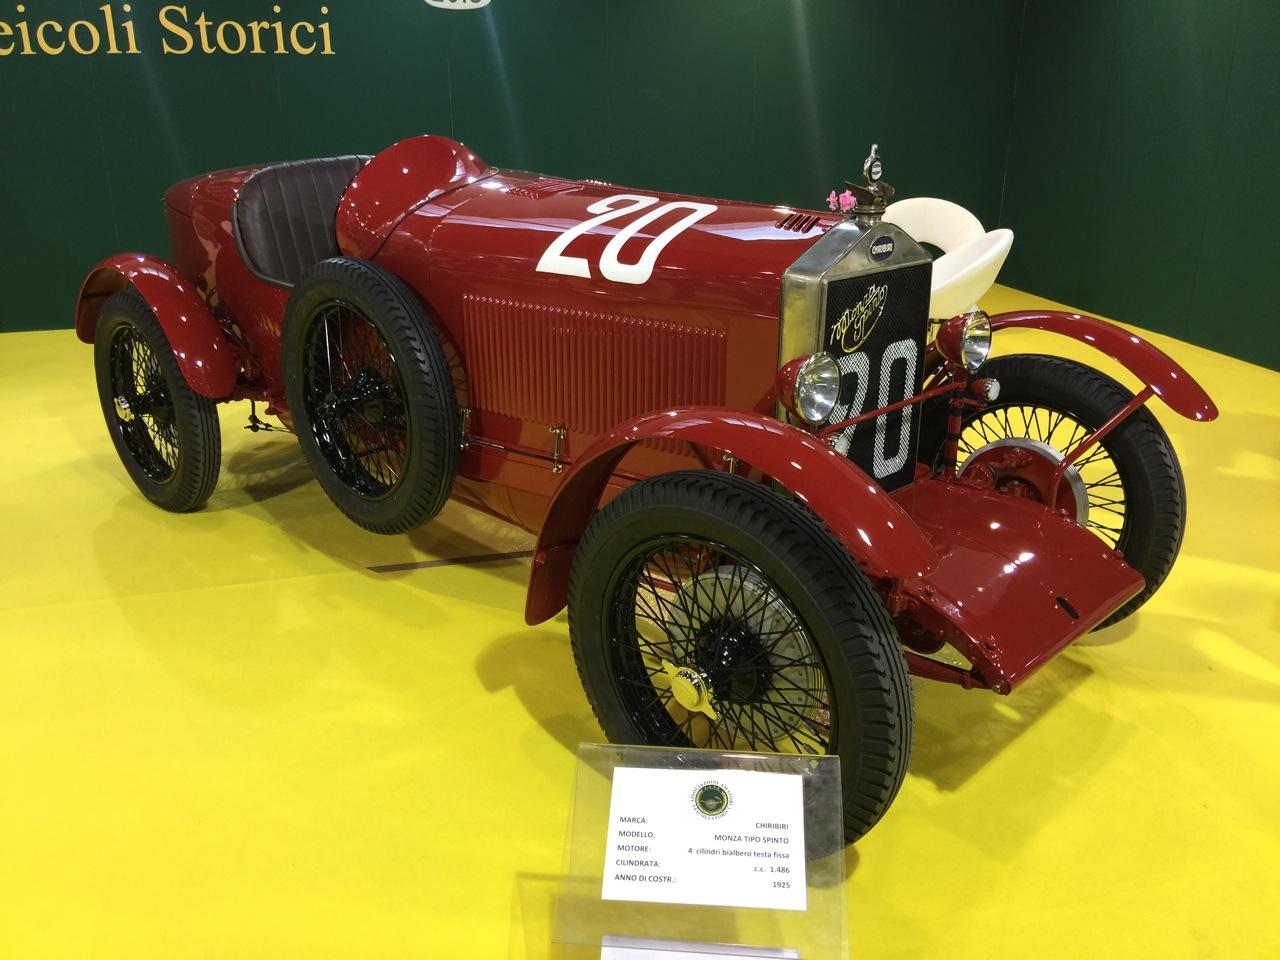 salzburg-padua-13-chiribiri-monza-tipo-spinto-4r-1486cc-1925